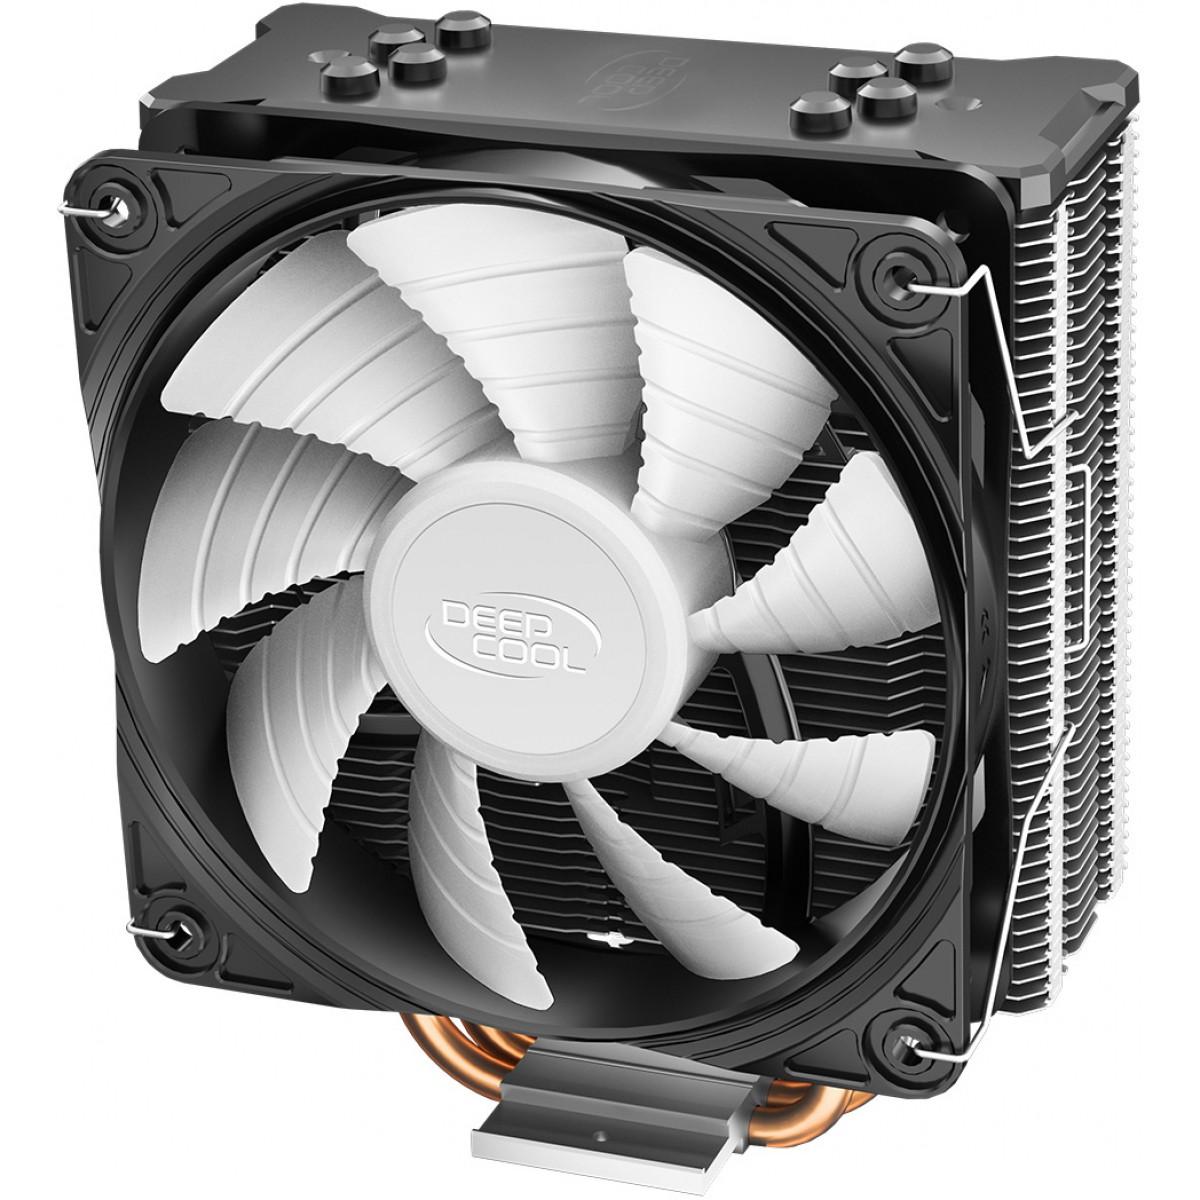 Cooler DeepCool Gammax GTE V2 RGB, 120mm, Intel-AMD